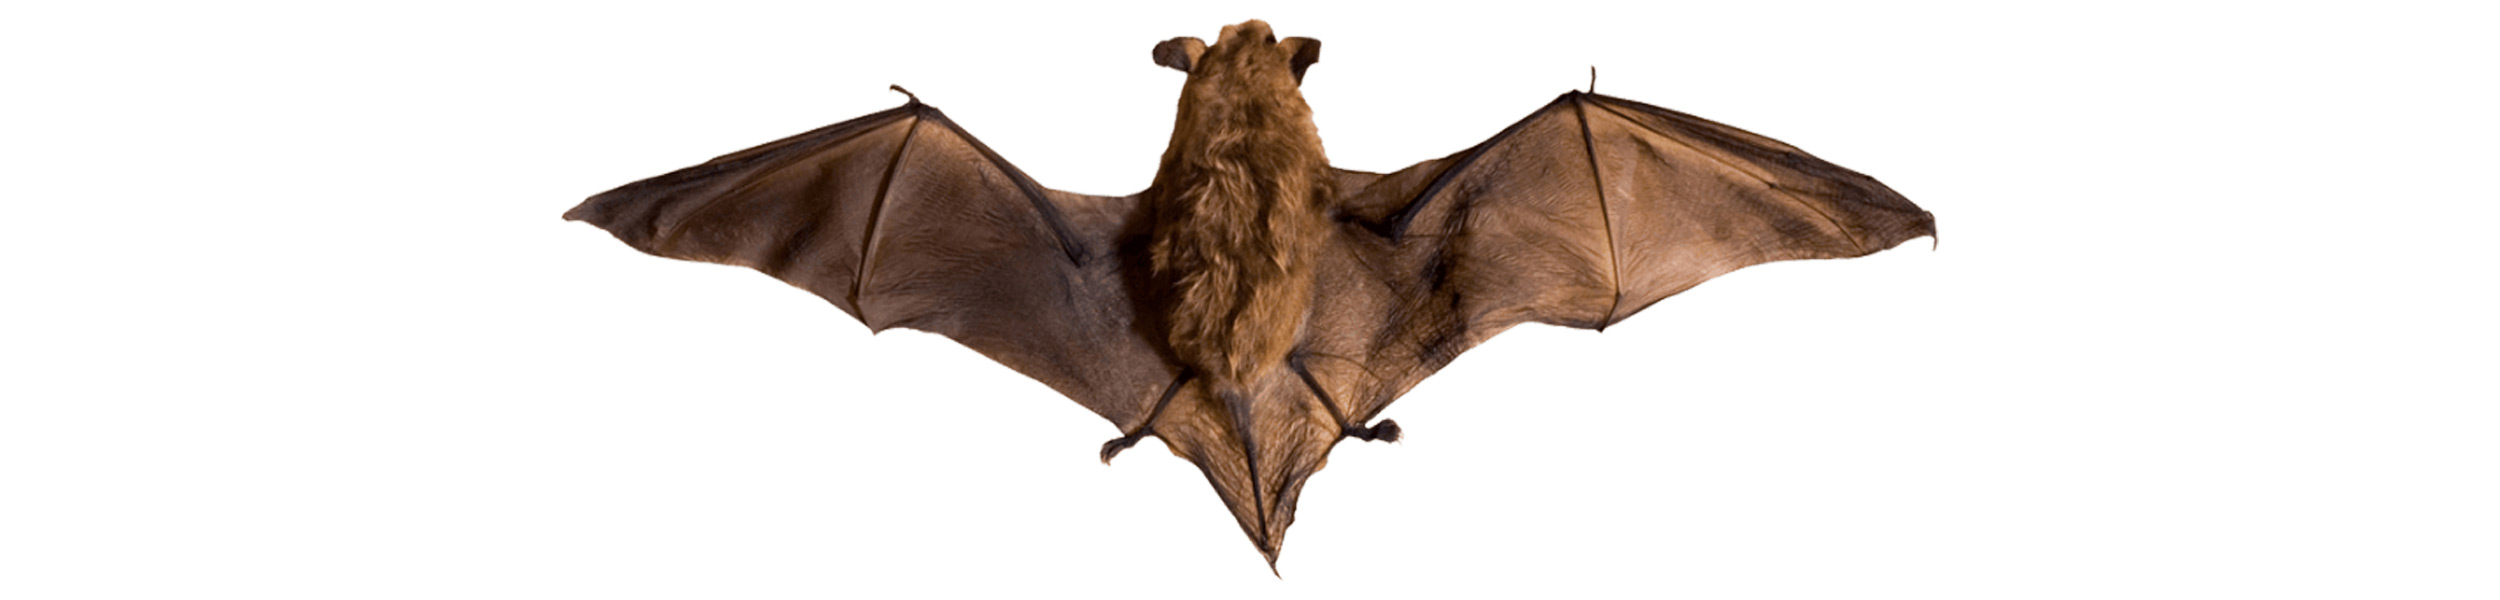 ACE Exterminating-Pest-Control-Bats-Header